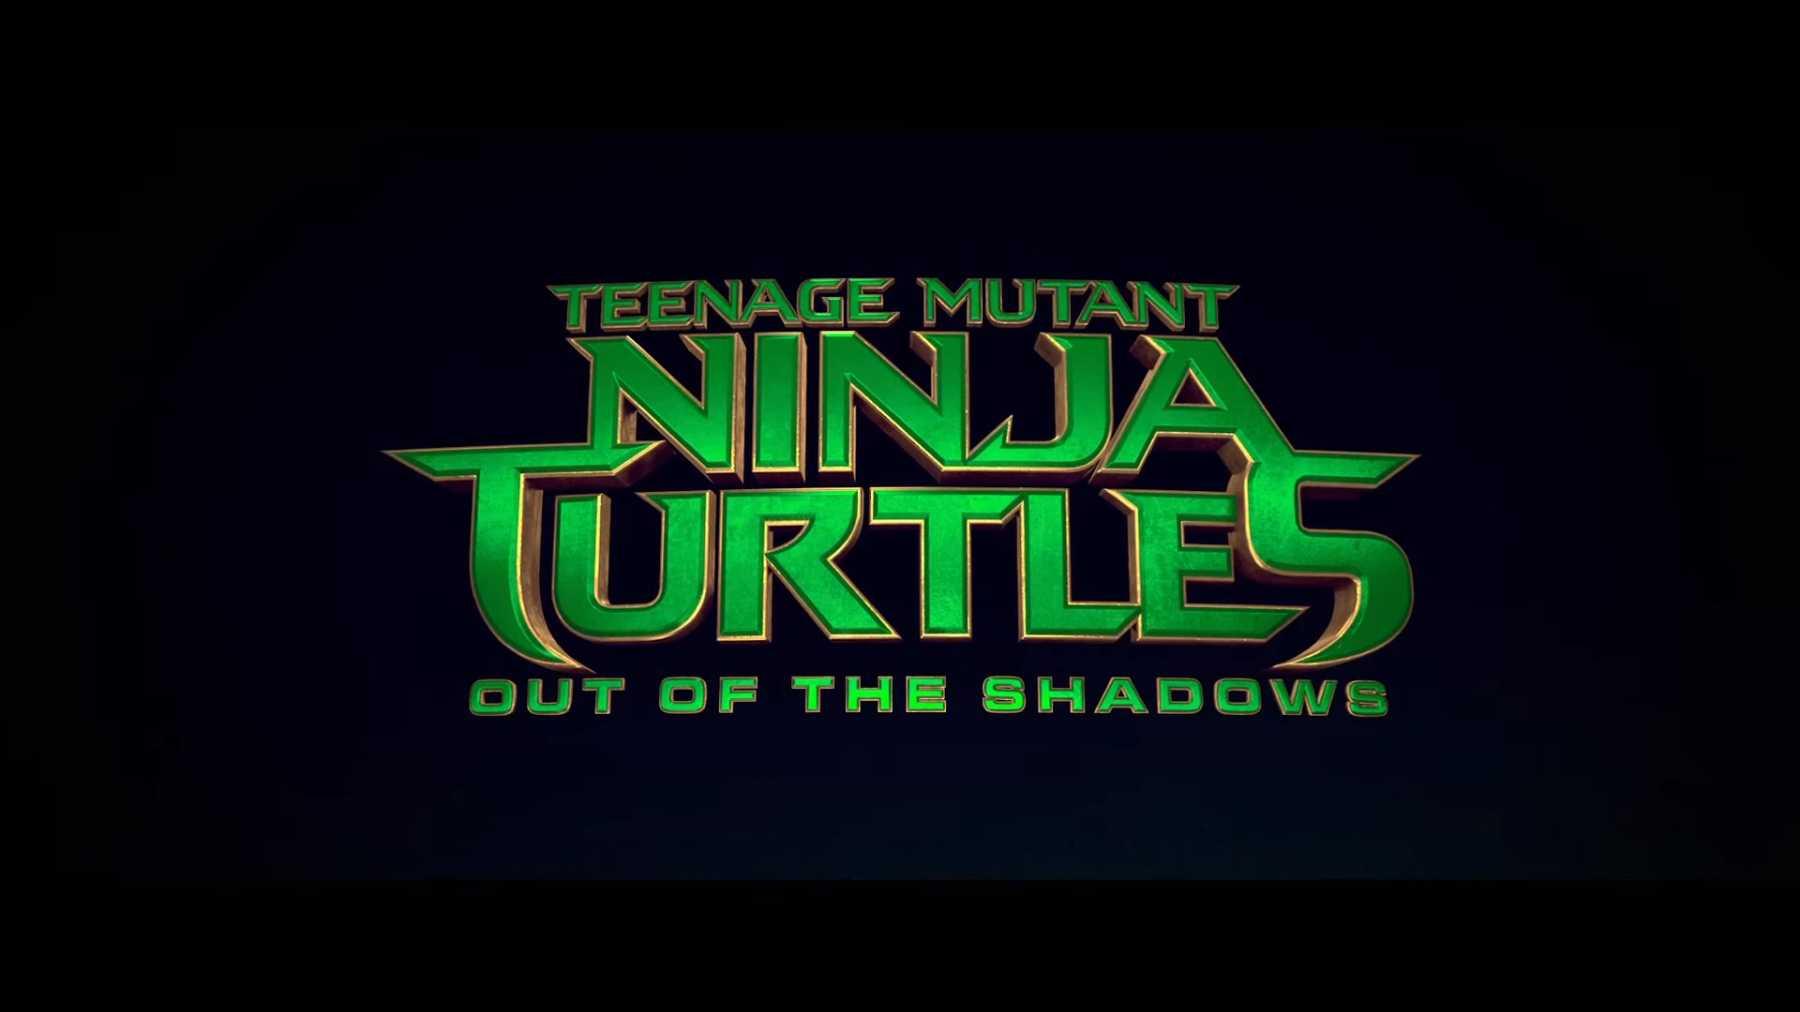 They're Back! Trailer For Teenage Mutant Ninja Turtles 2 Lands | Teenage Mutant Ninja Turtles 2